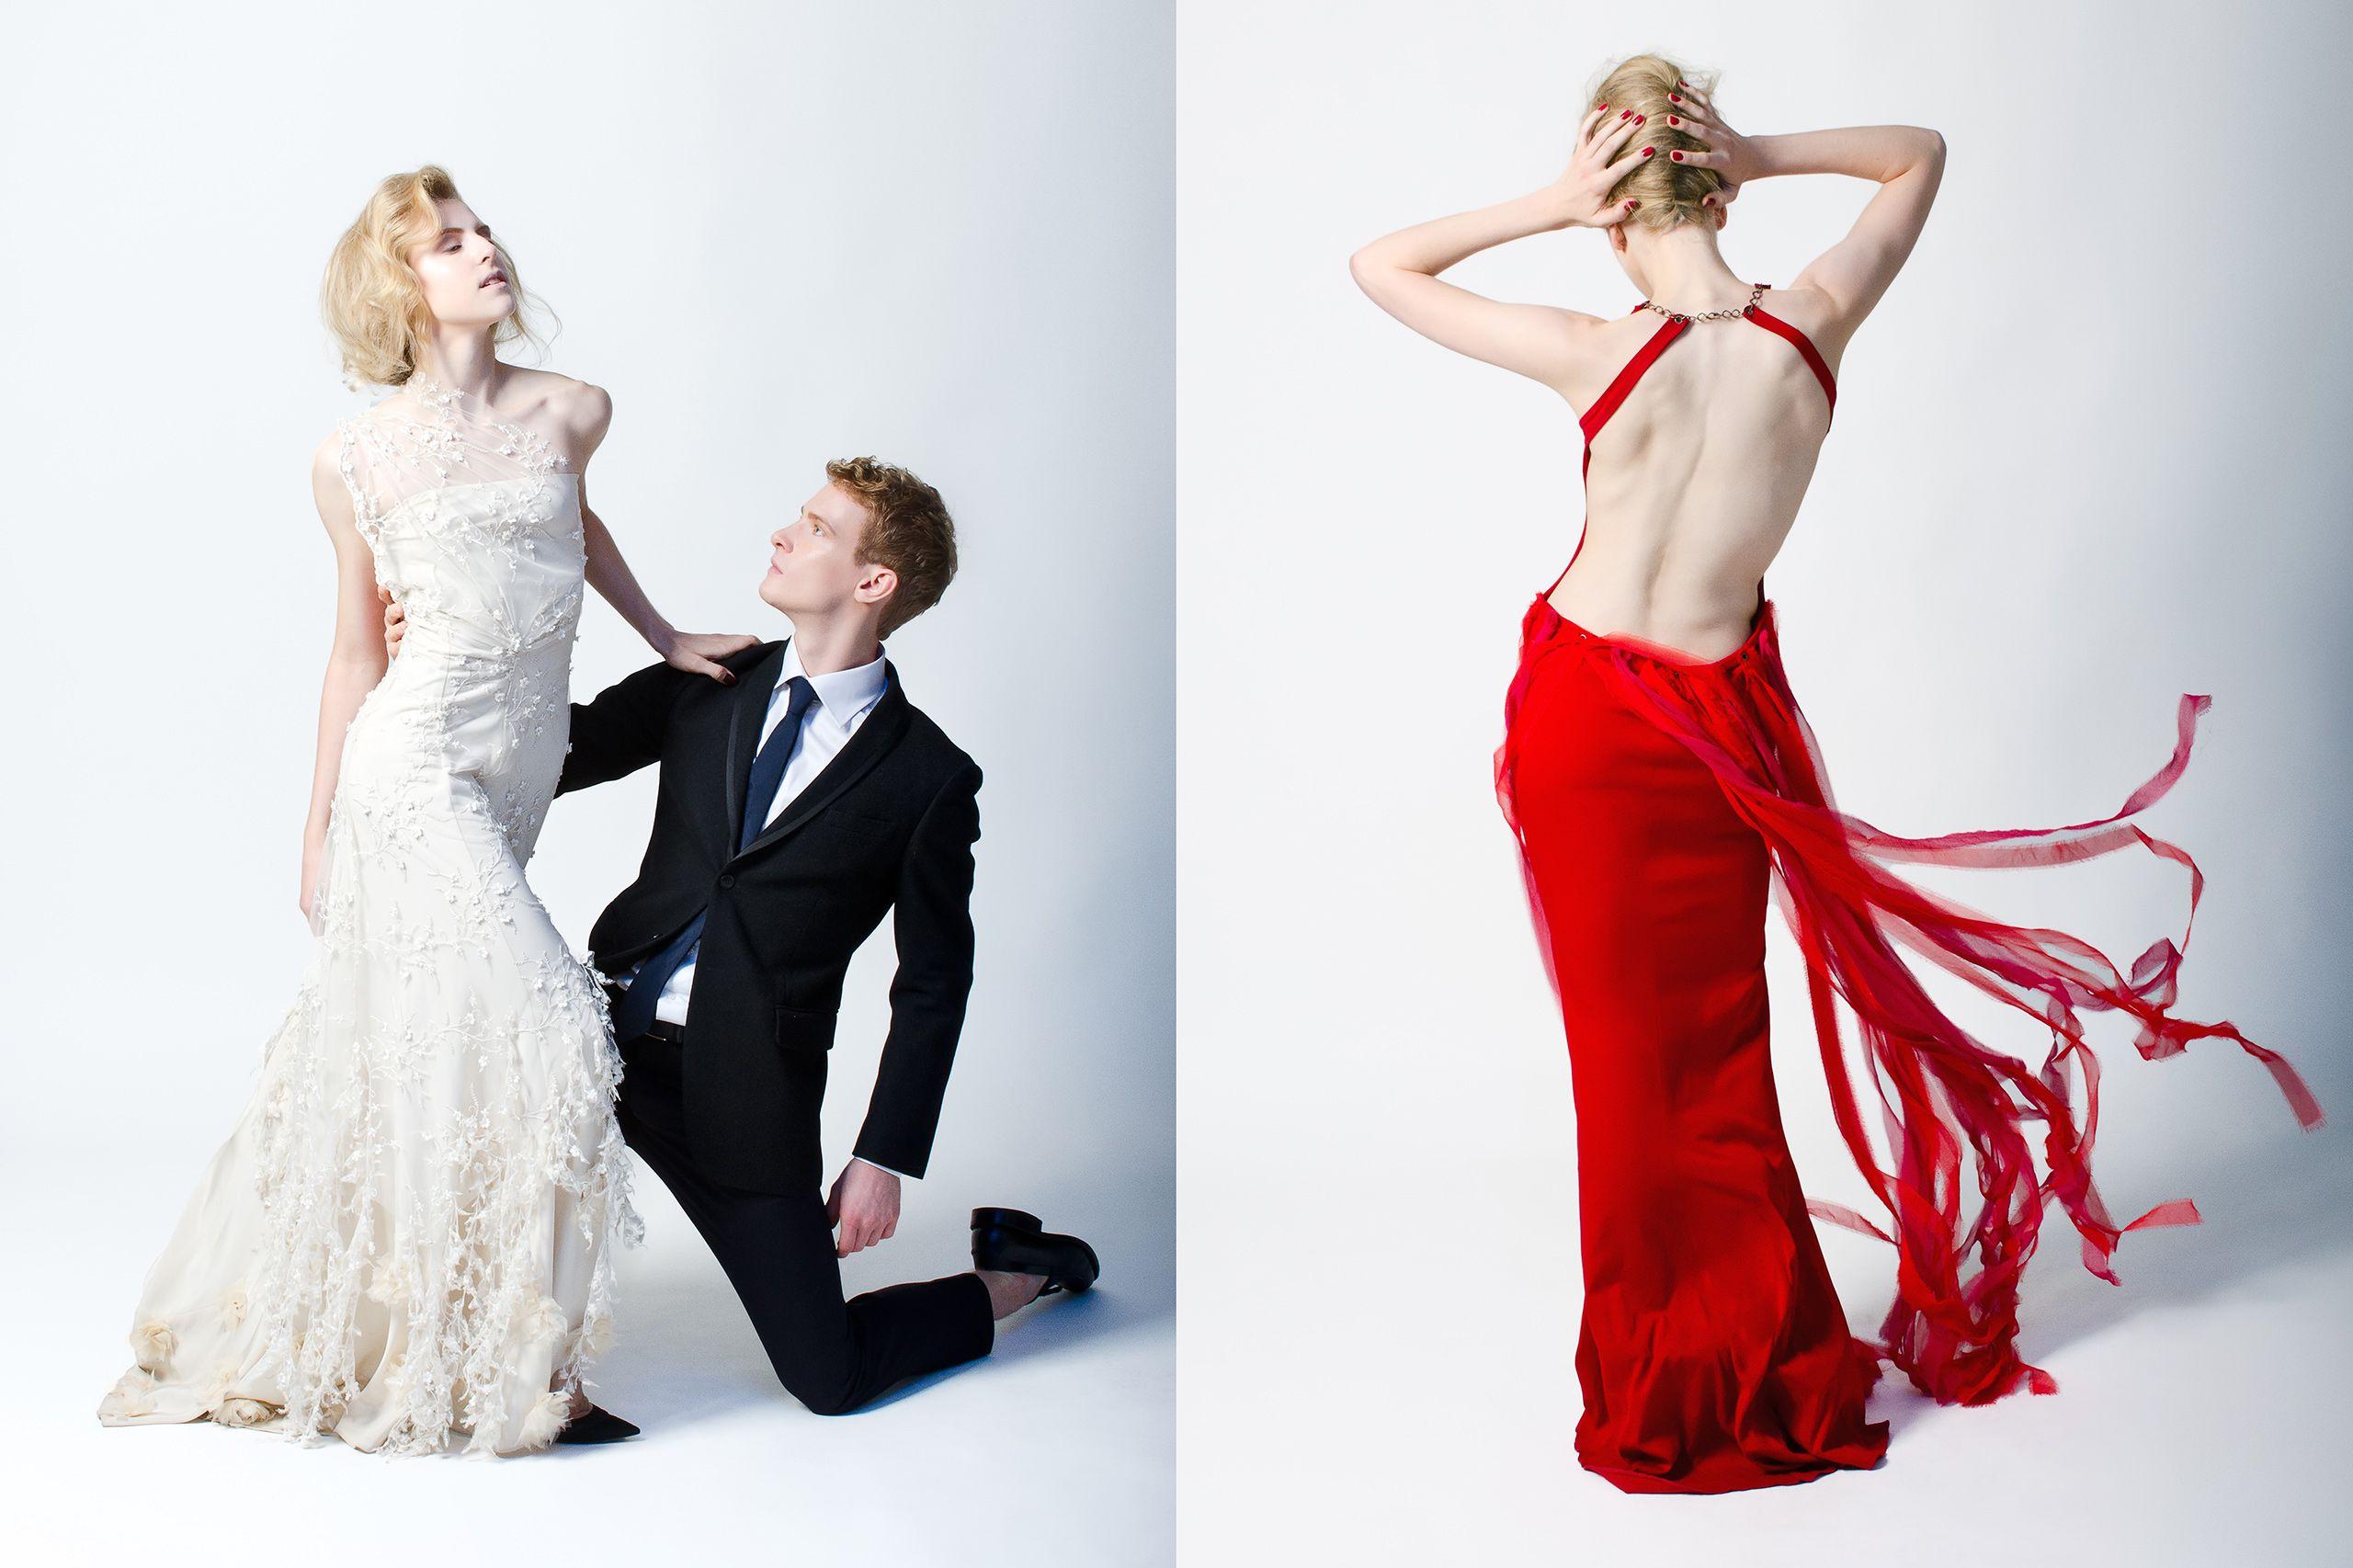 fashion: women